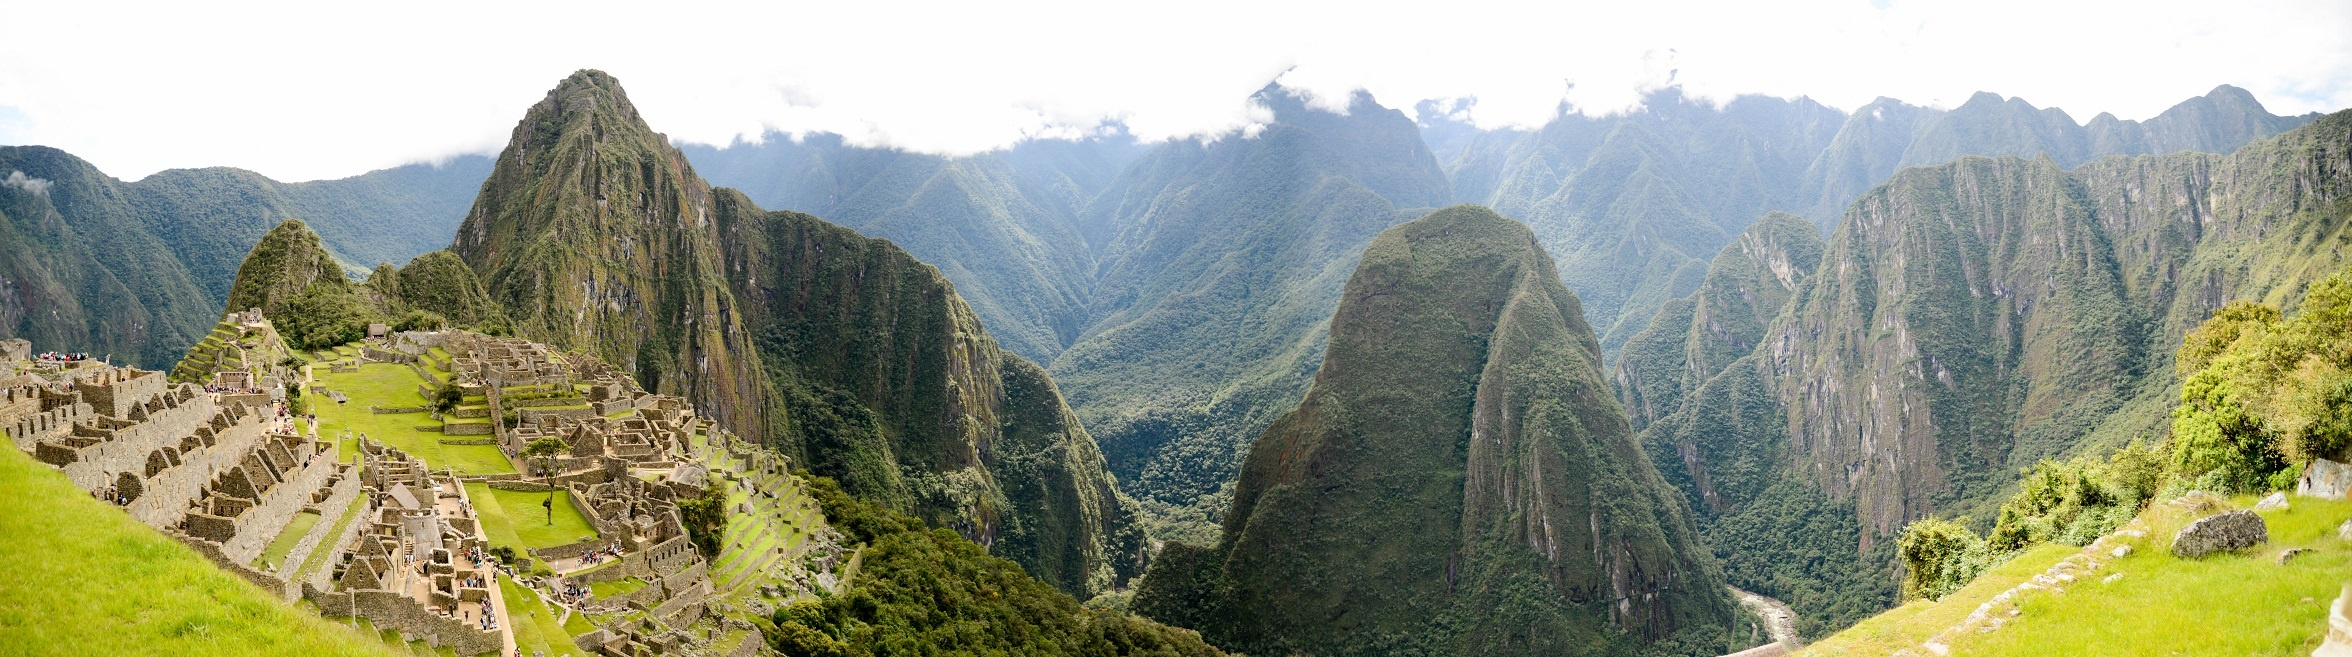 MachuPicchu_Panorama1